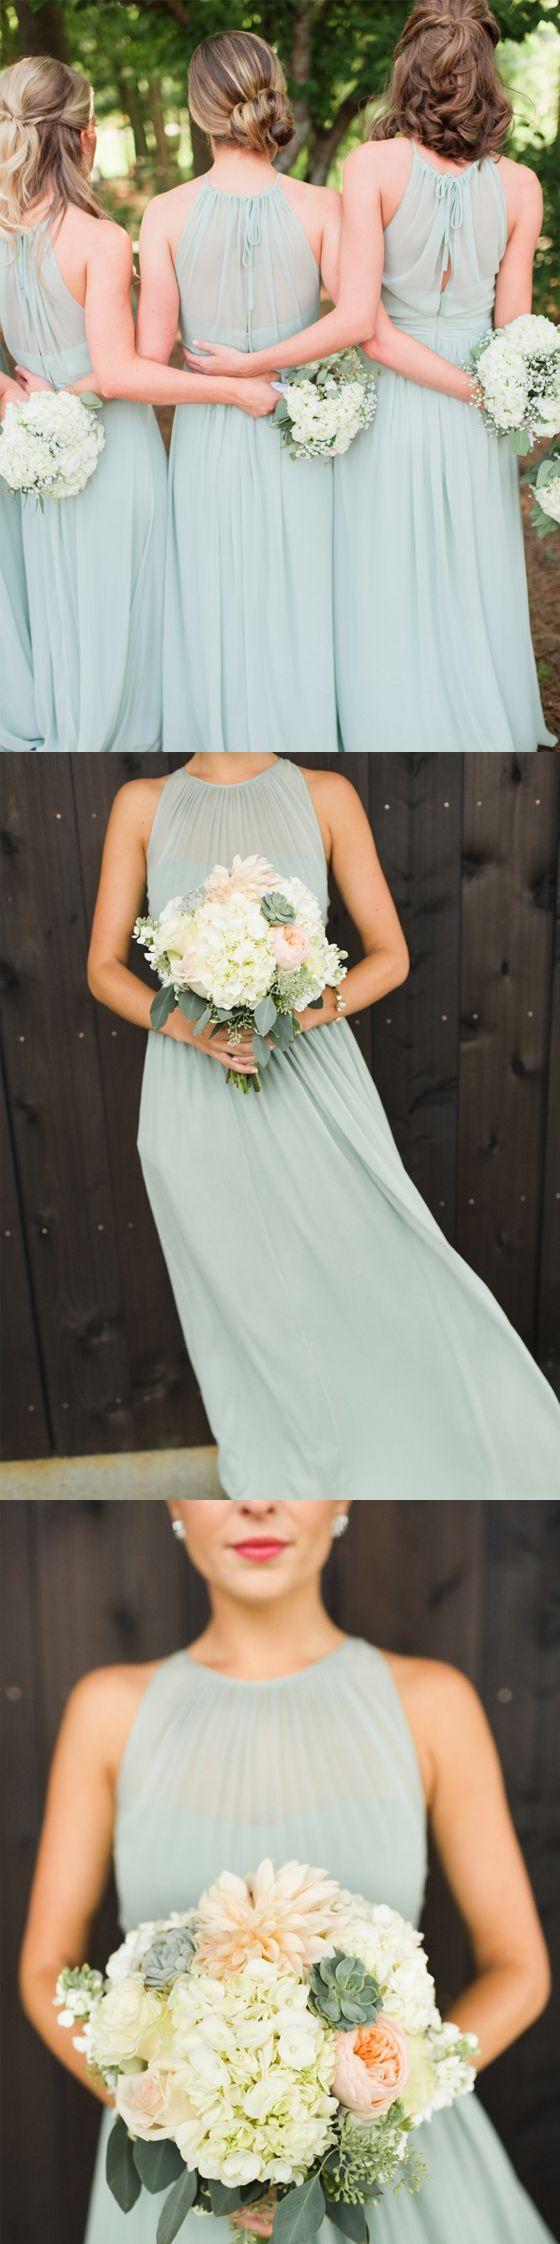 Charming Chiffon Formal Wedding Party Guest Long Bridesmaid Dresses, BG51616